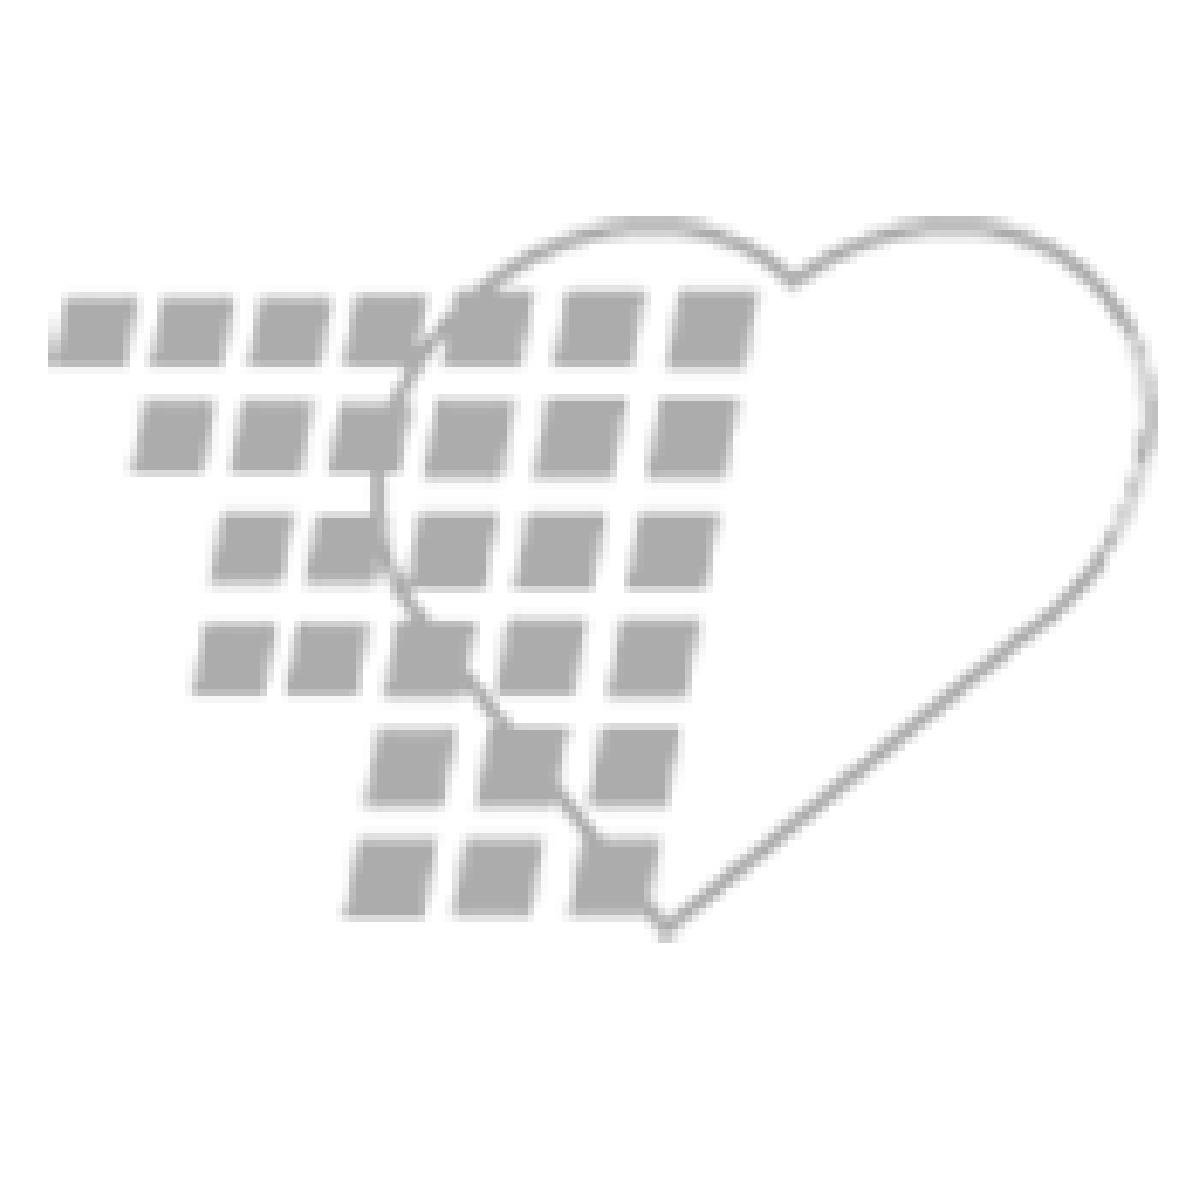 06-93-0089 Demo Dose® Memantin (Namend) 10 mg - 100 Pills/Bottle